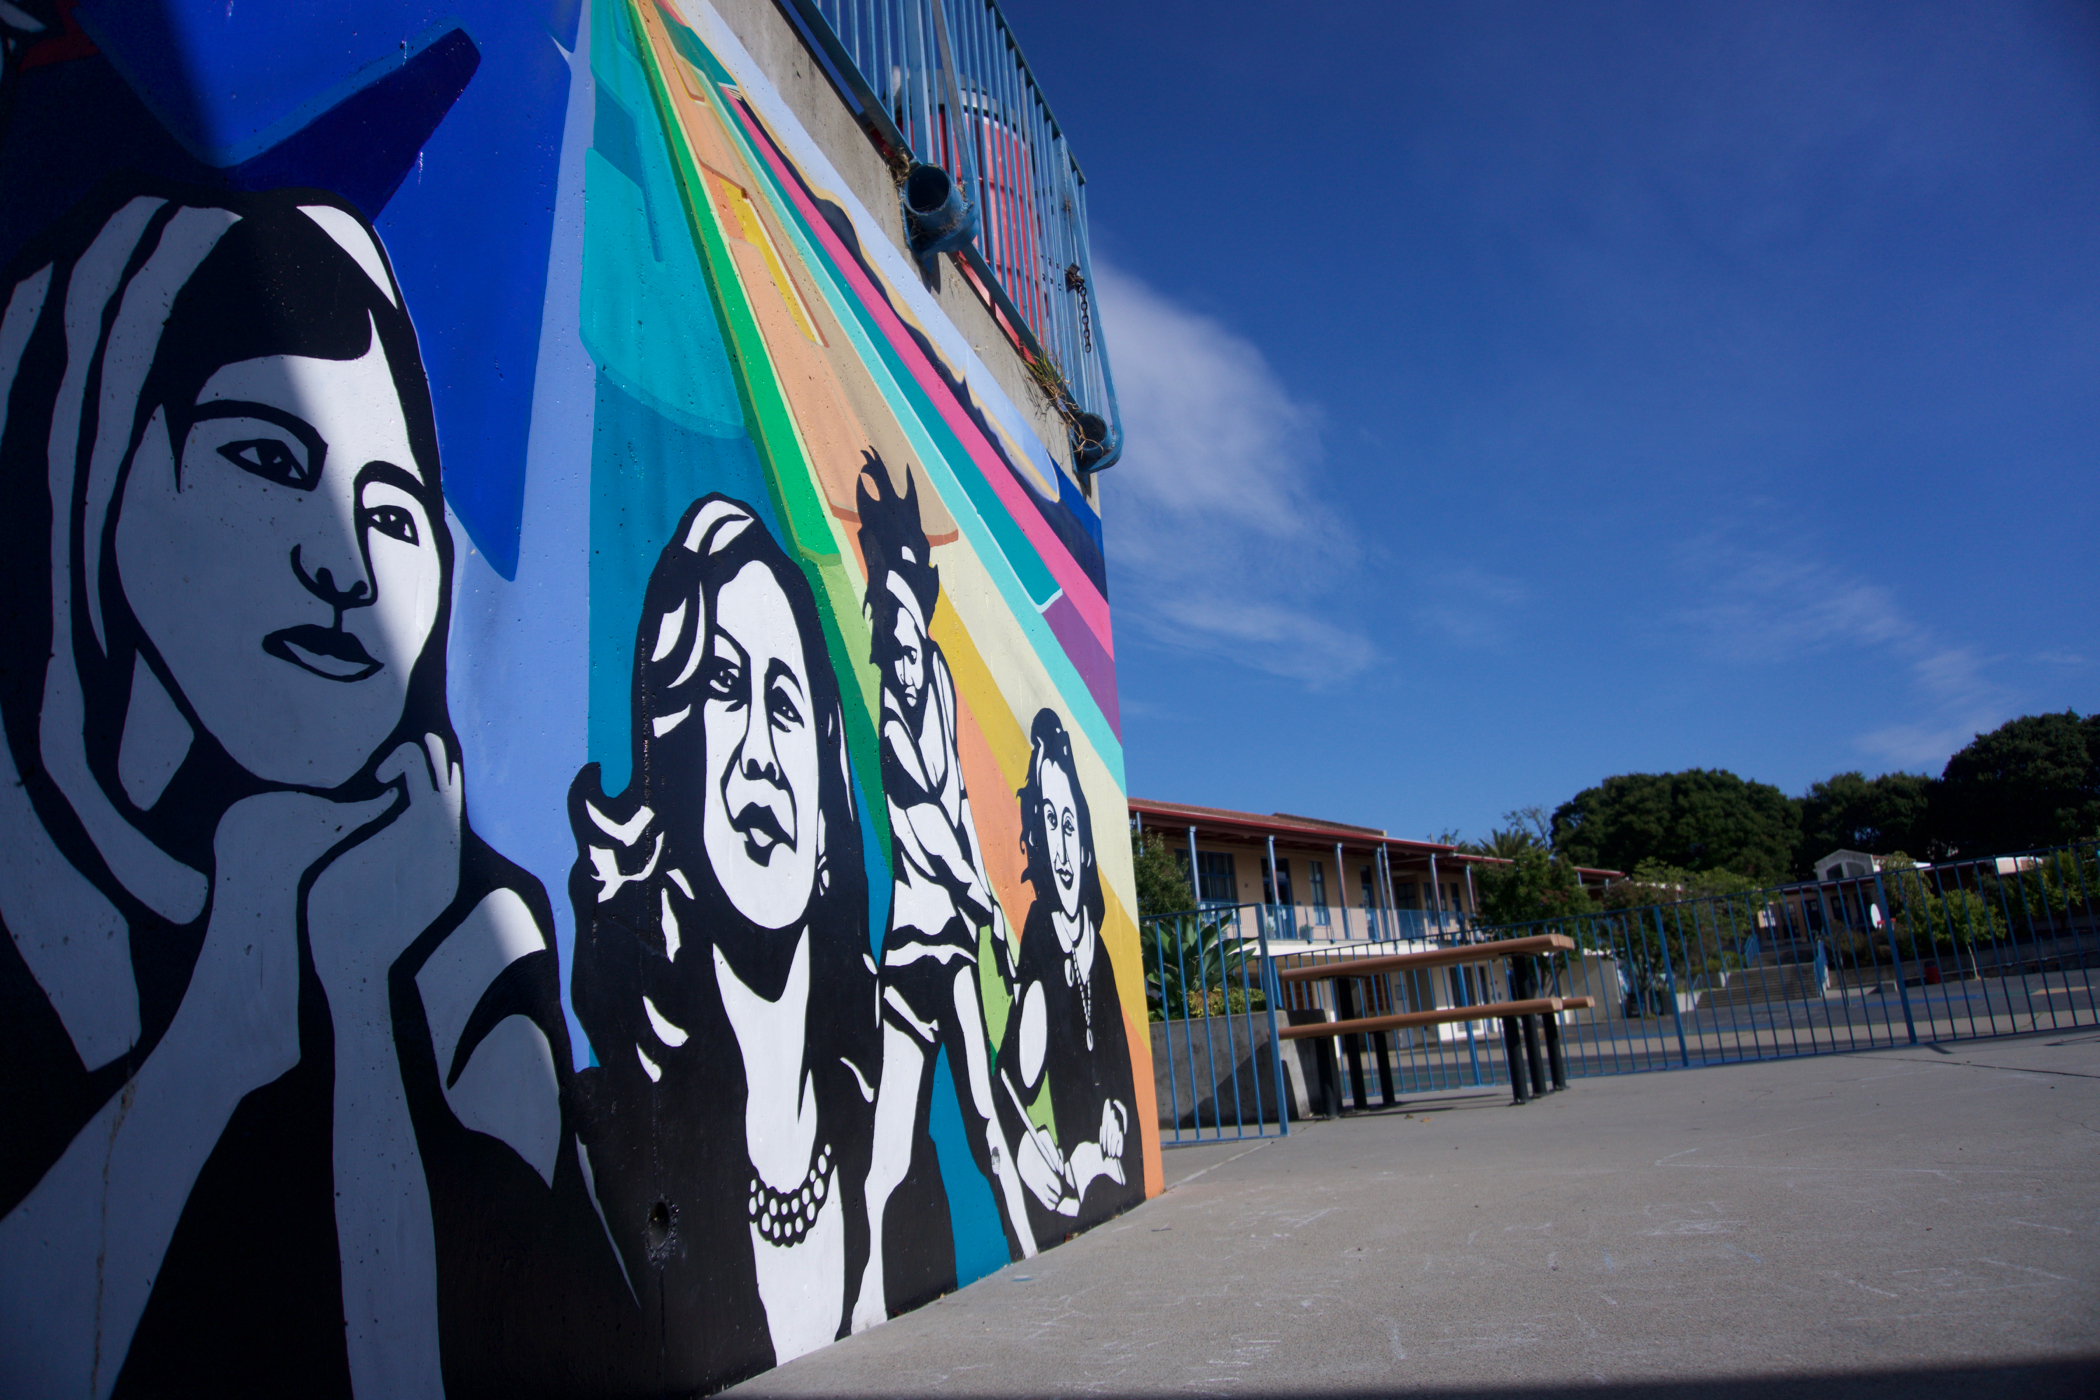 A mural at Thousand Oaks Elementary School in Berkeley, California features alumna Kamala Harris.